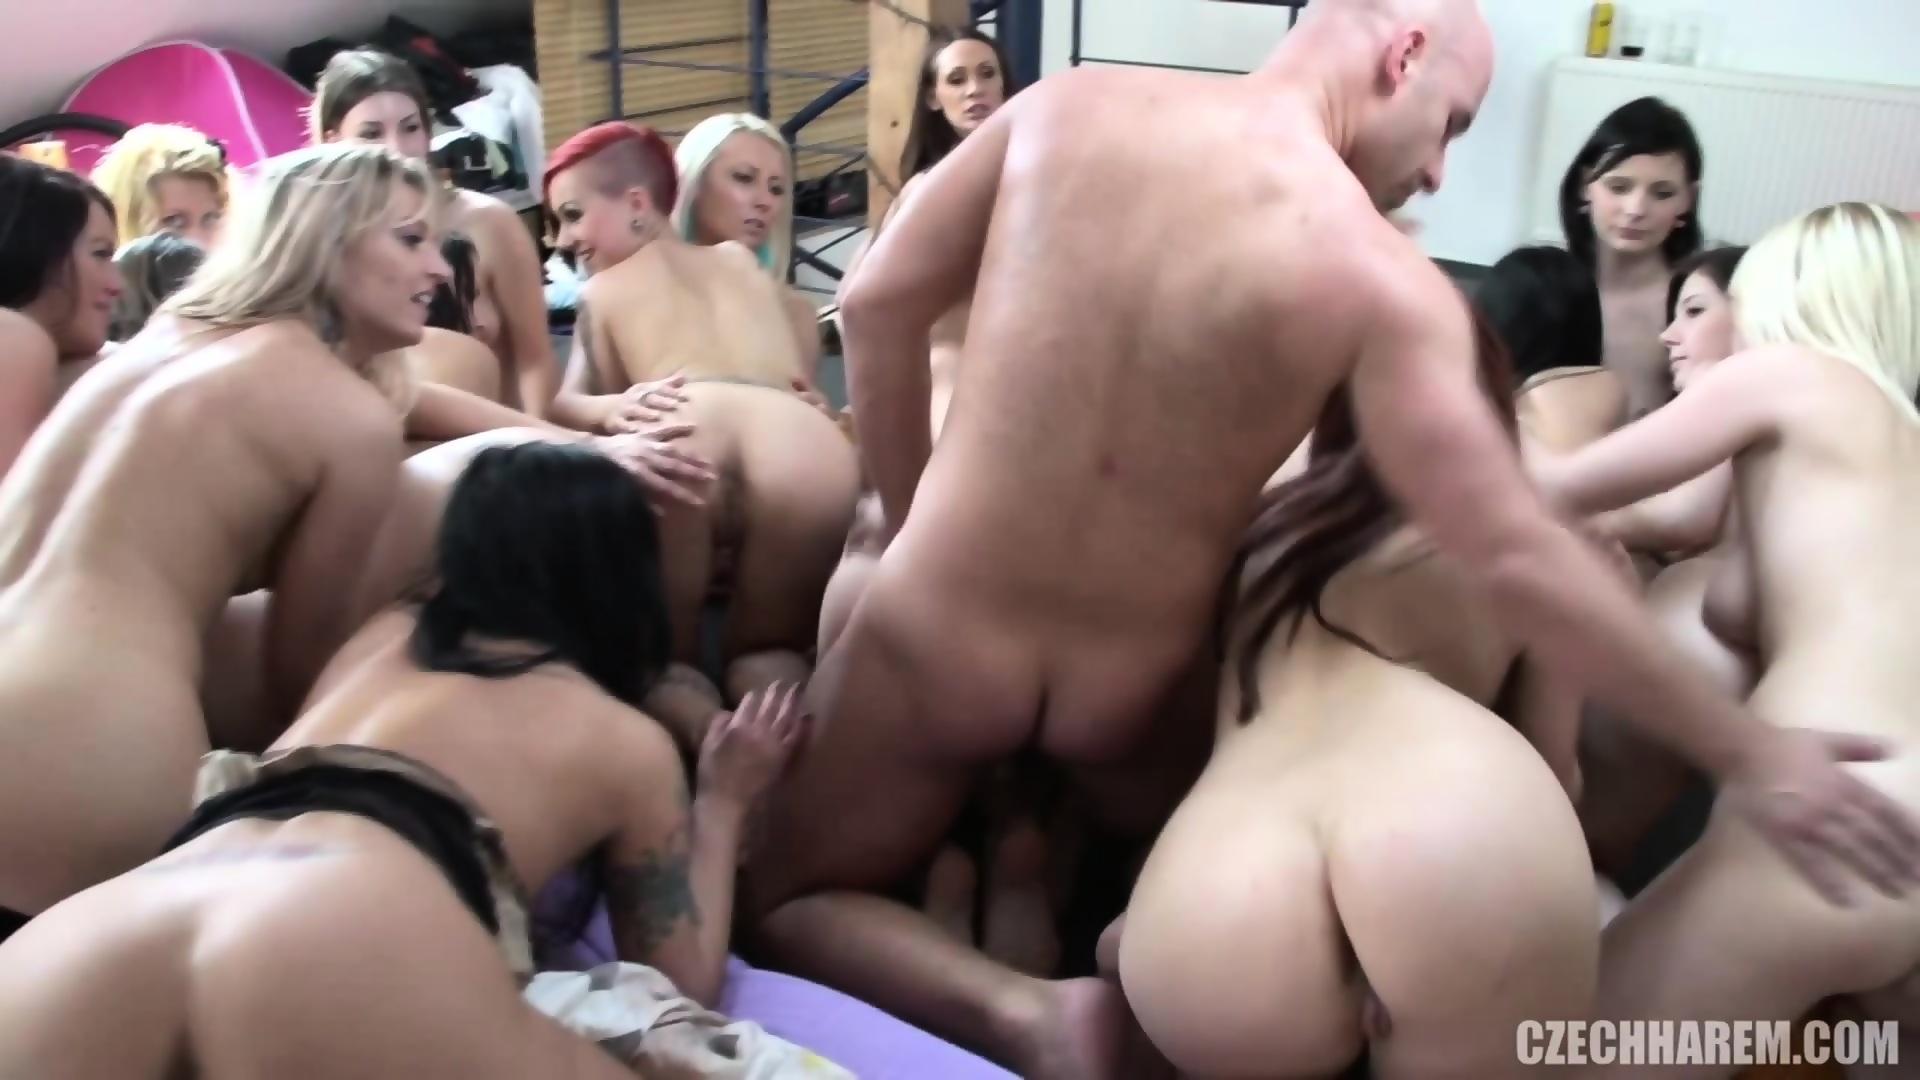 Maledom rough sex